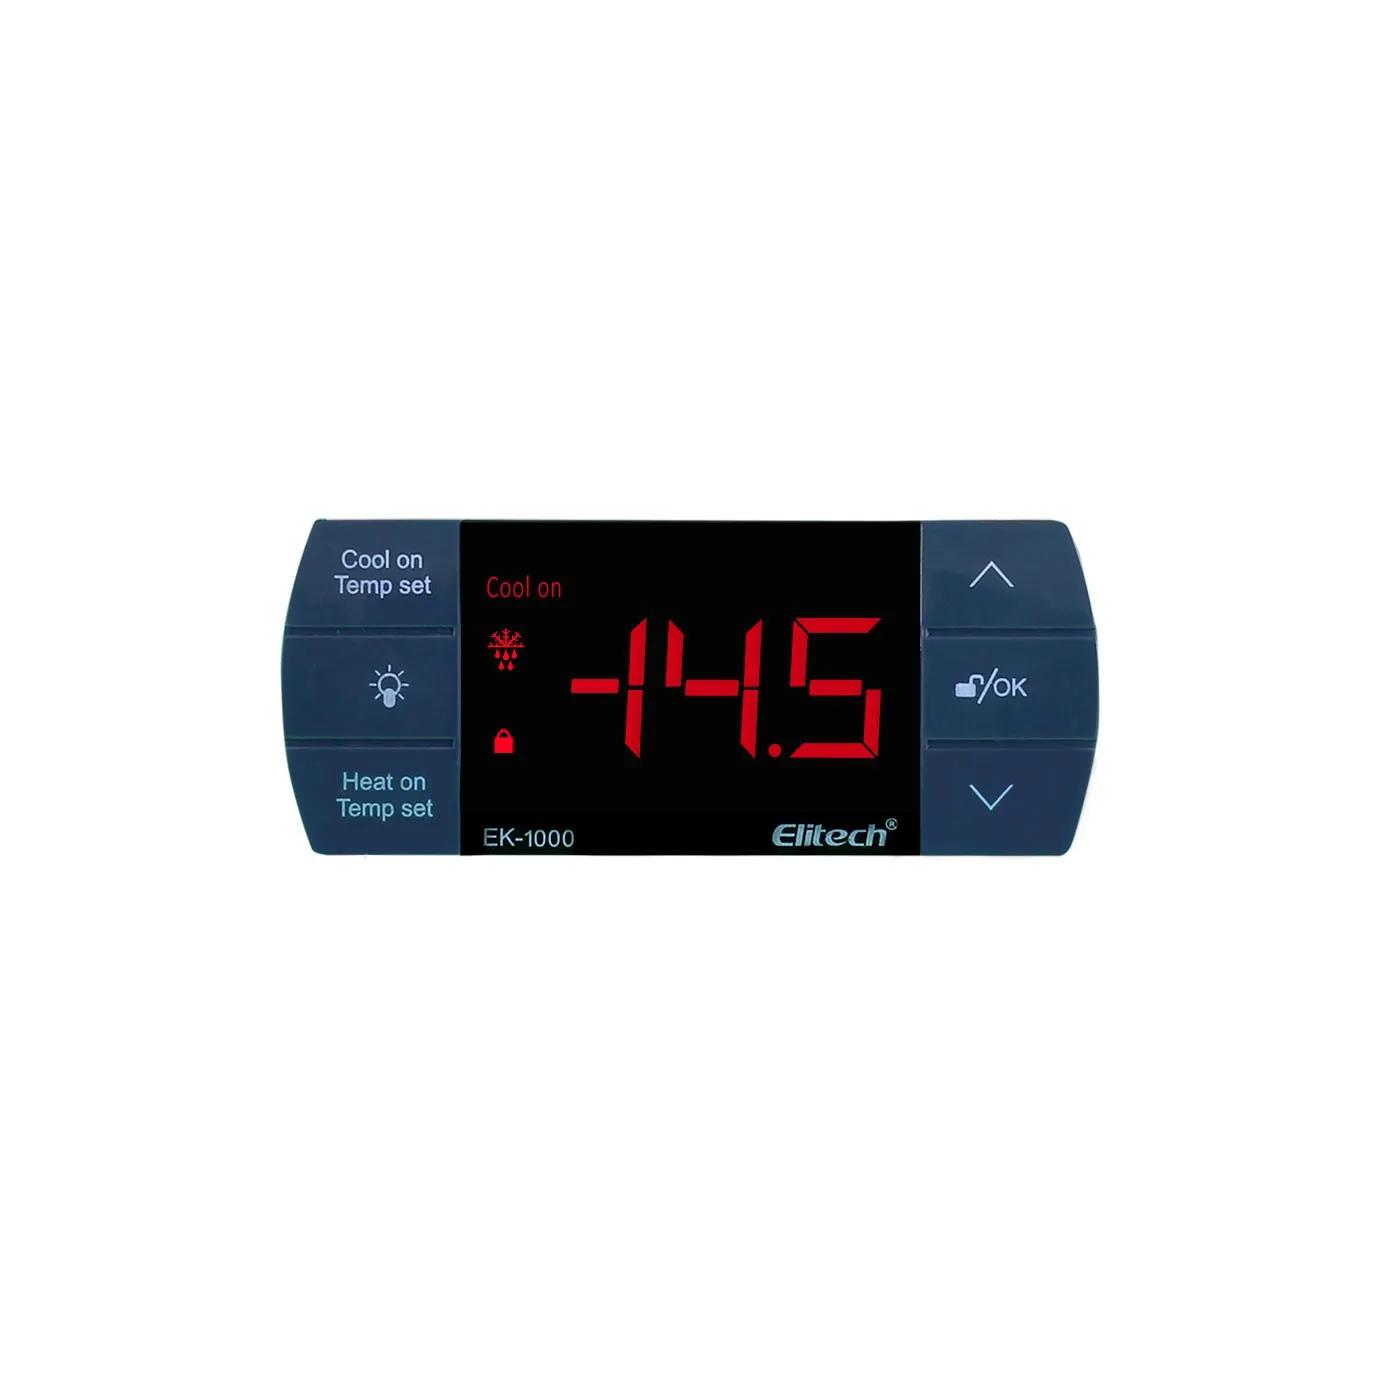 Controlador de Temperatura - 2 Estágios - EK-1000 - Elitech   - Lojão de Ofertas